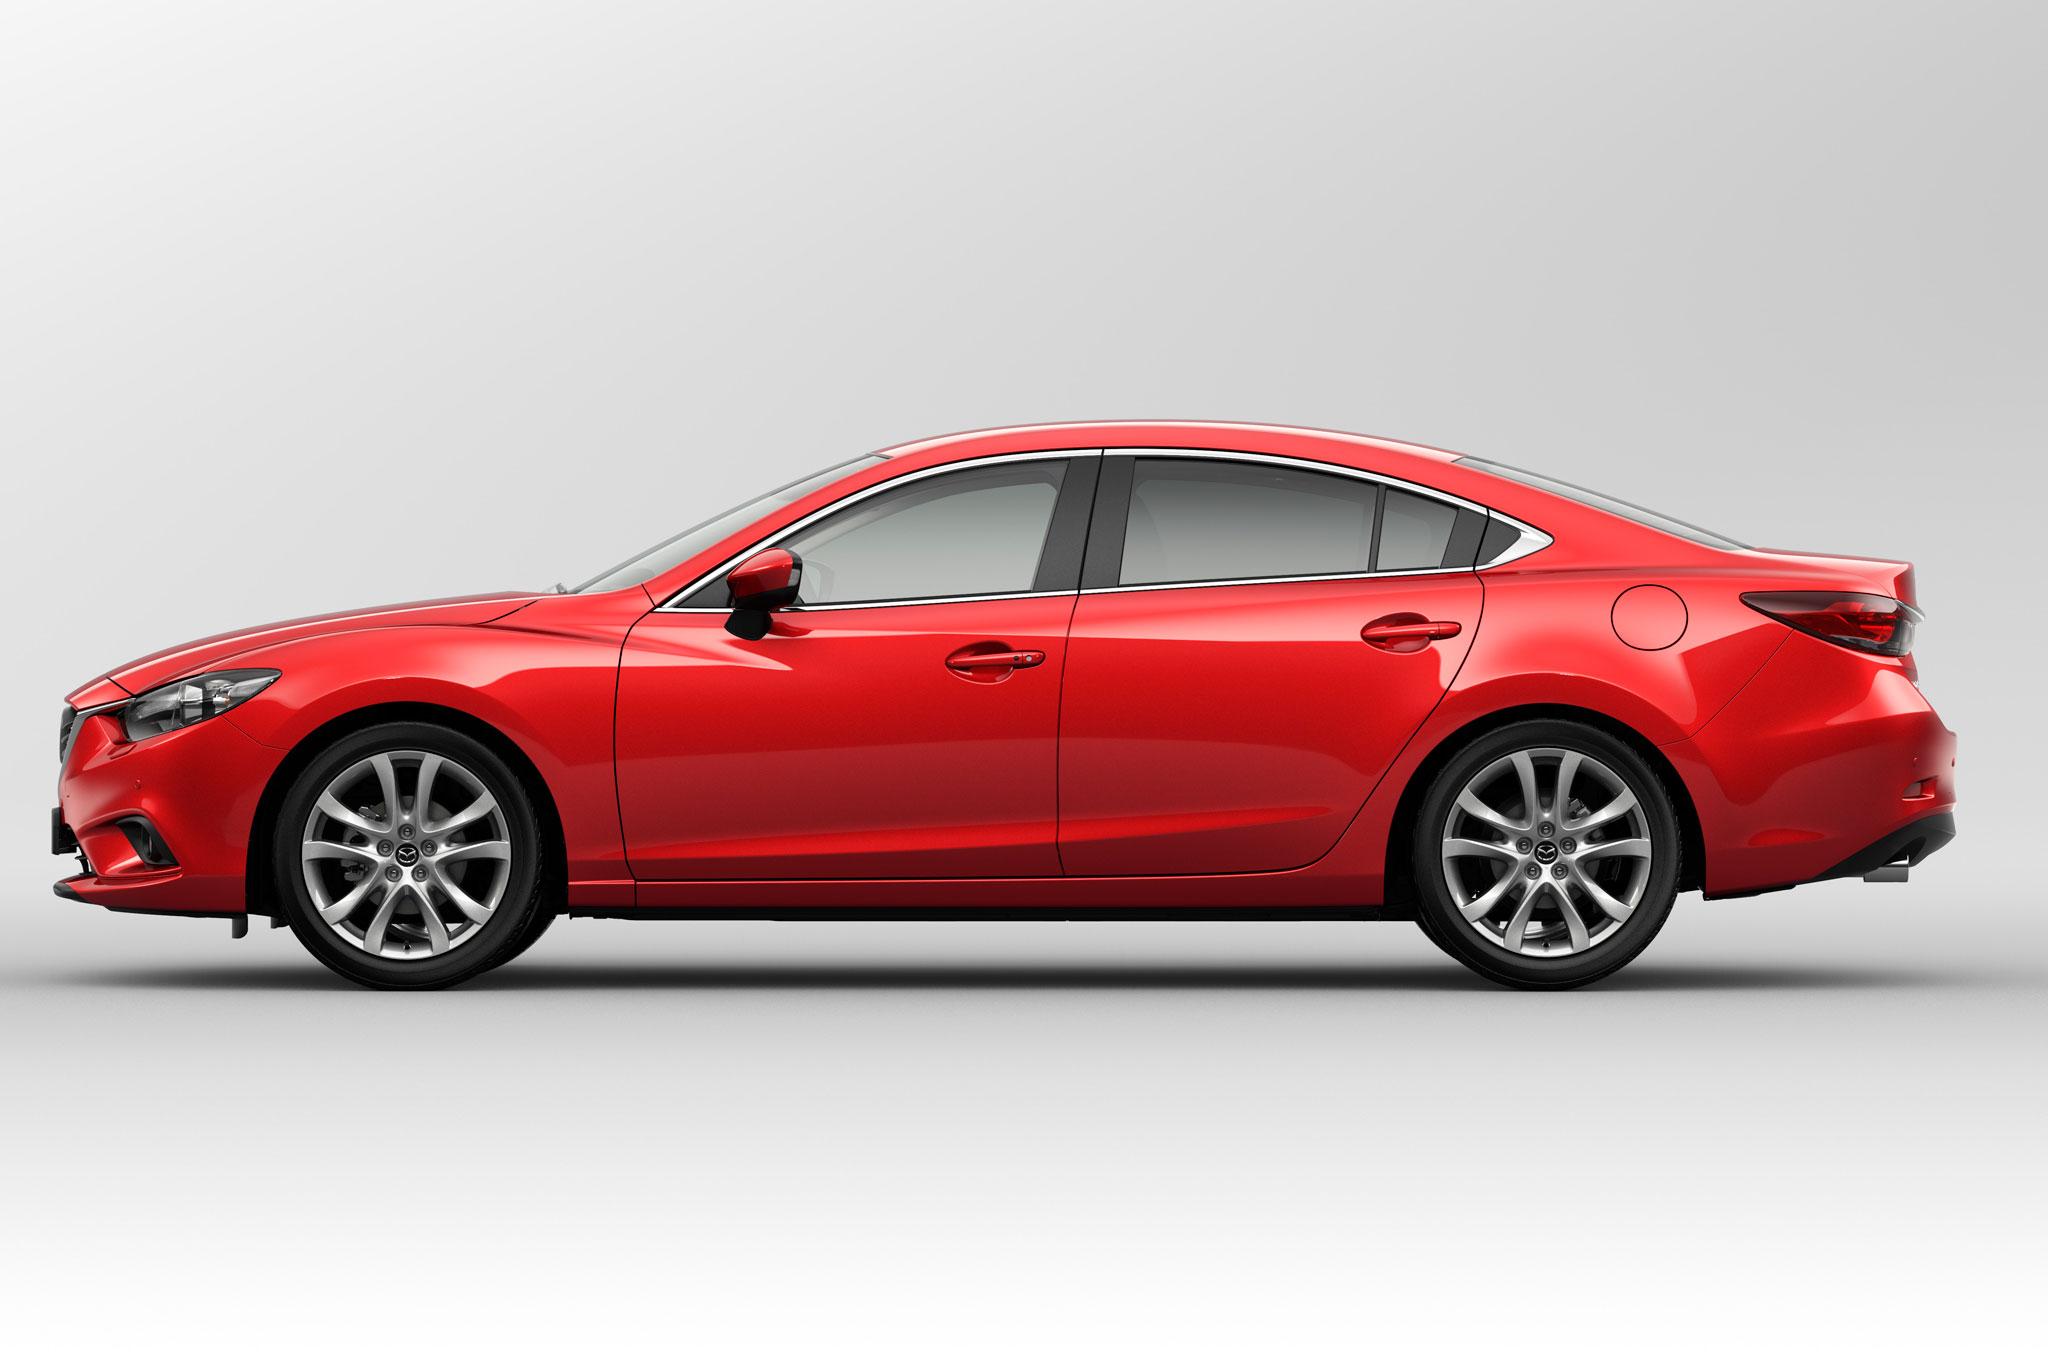 2015 Mazda Lineup 14 Car Desktop Background